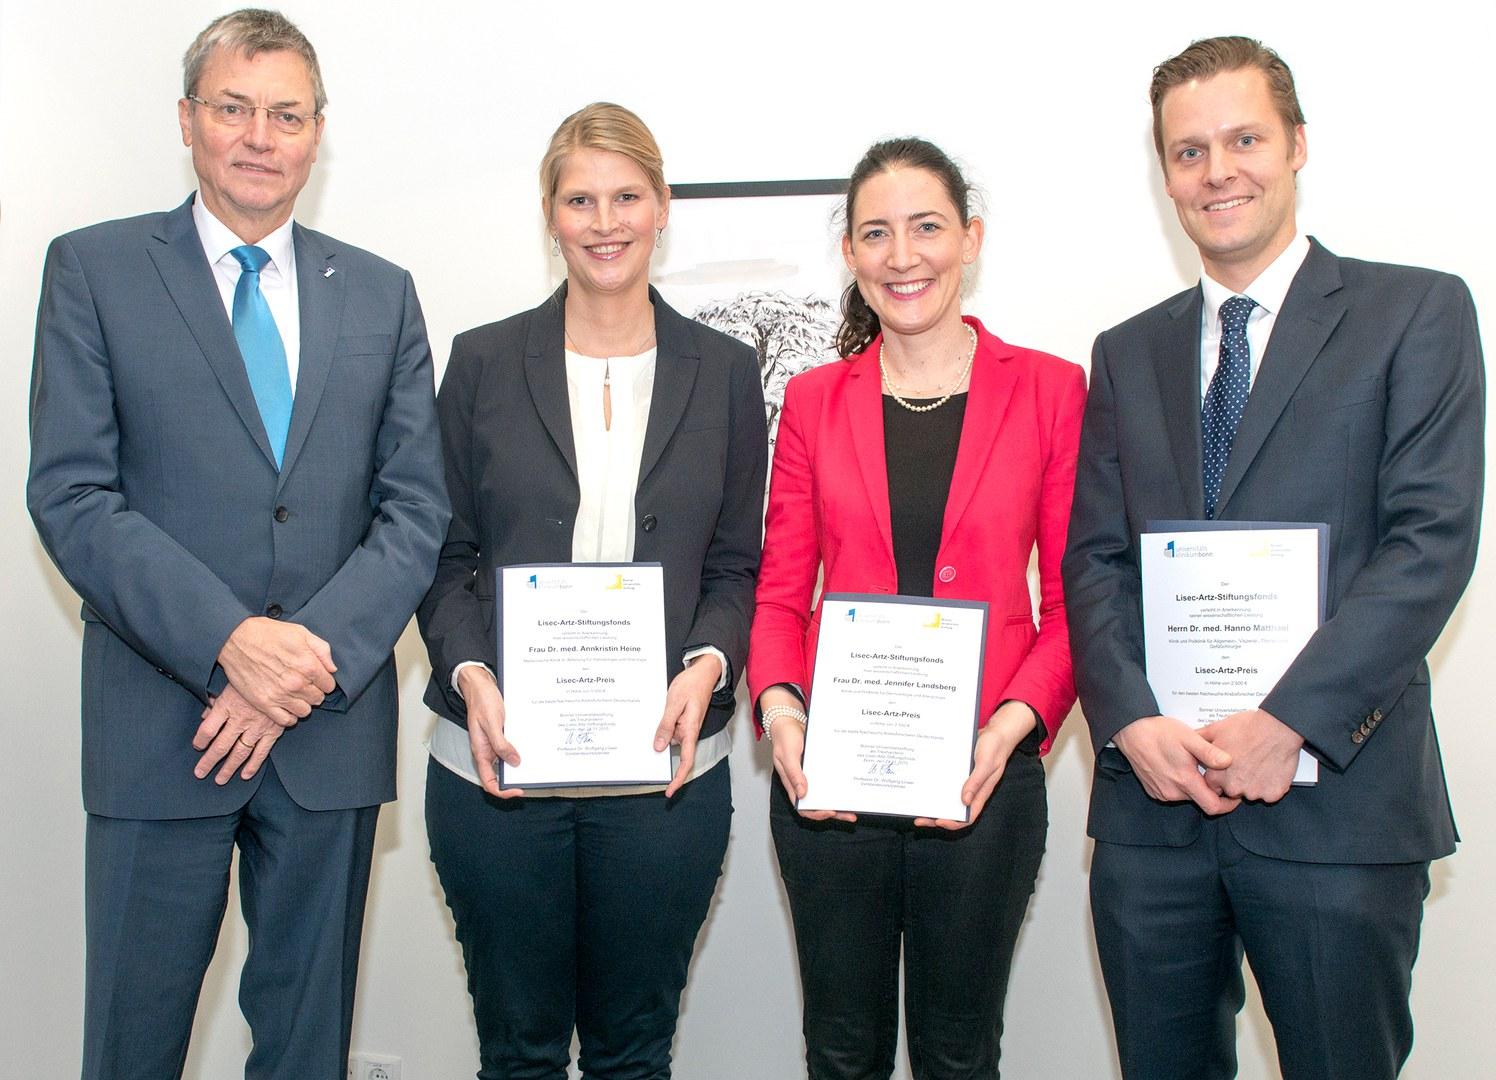 Verleihung des Lisec-Artz-Preises: